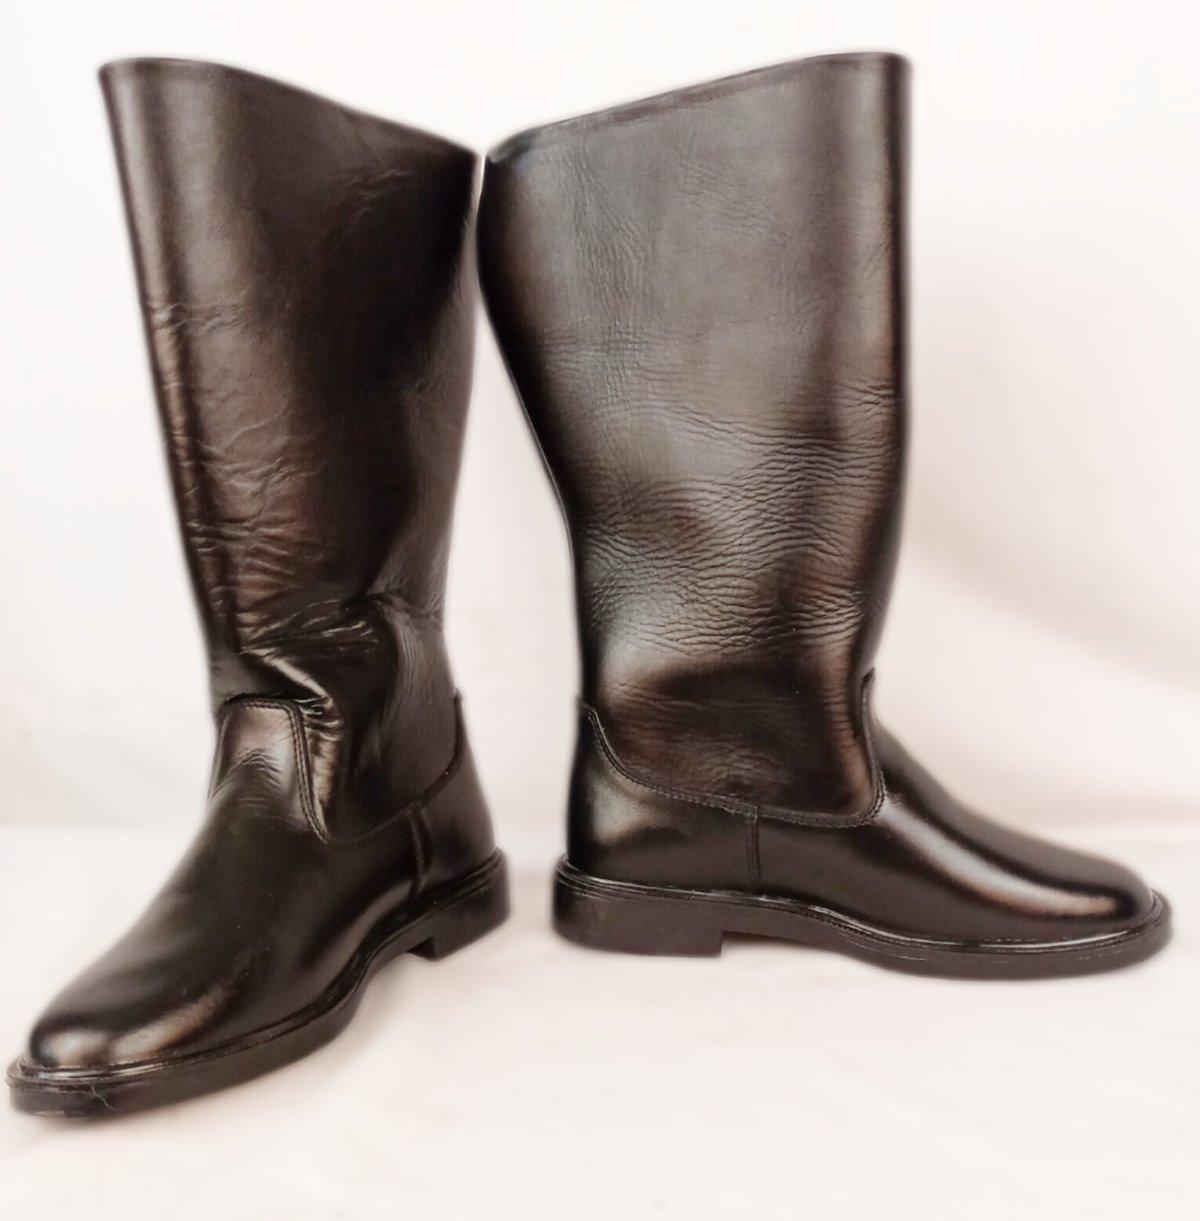 Image of #27- B Grade from Stock - Shoe Size EU 39